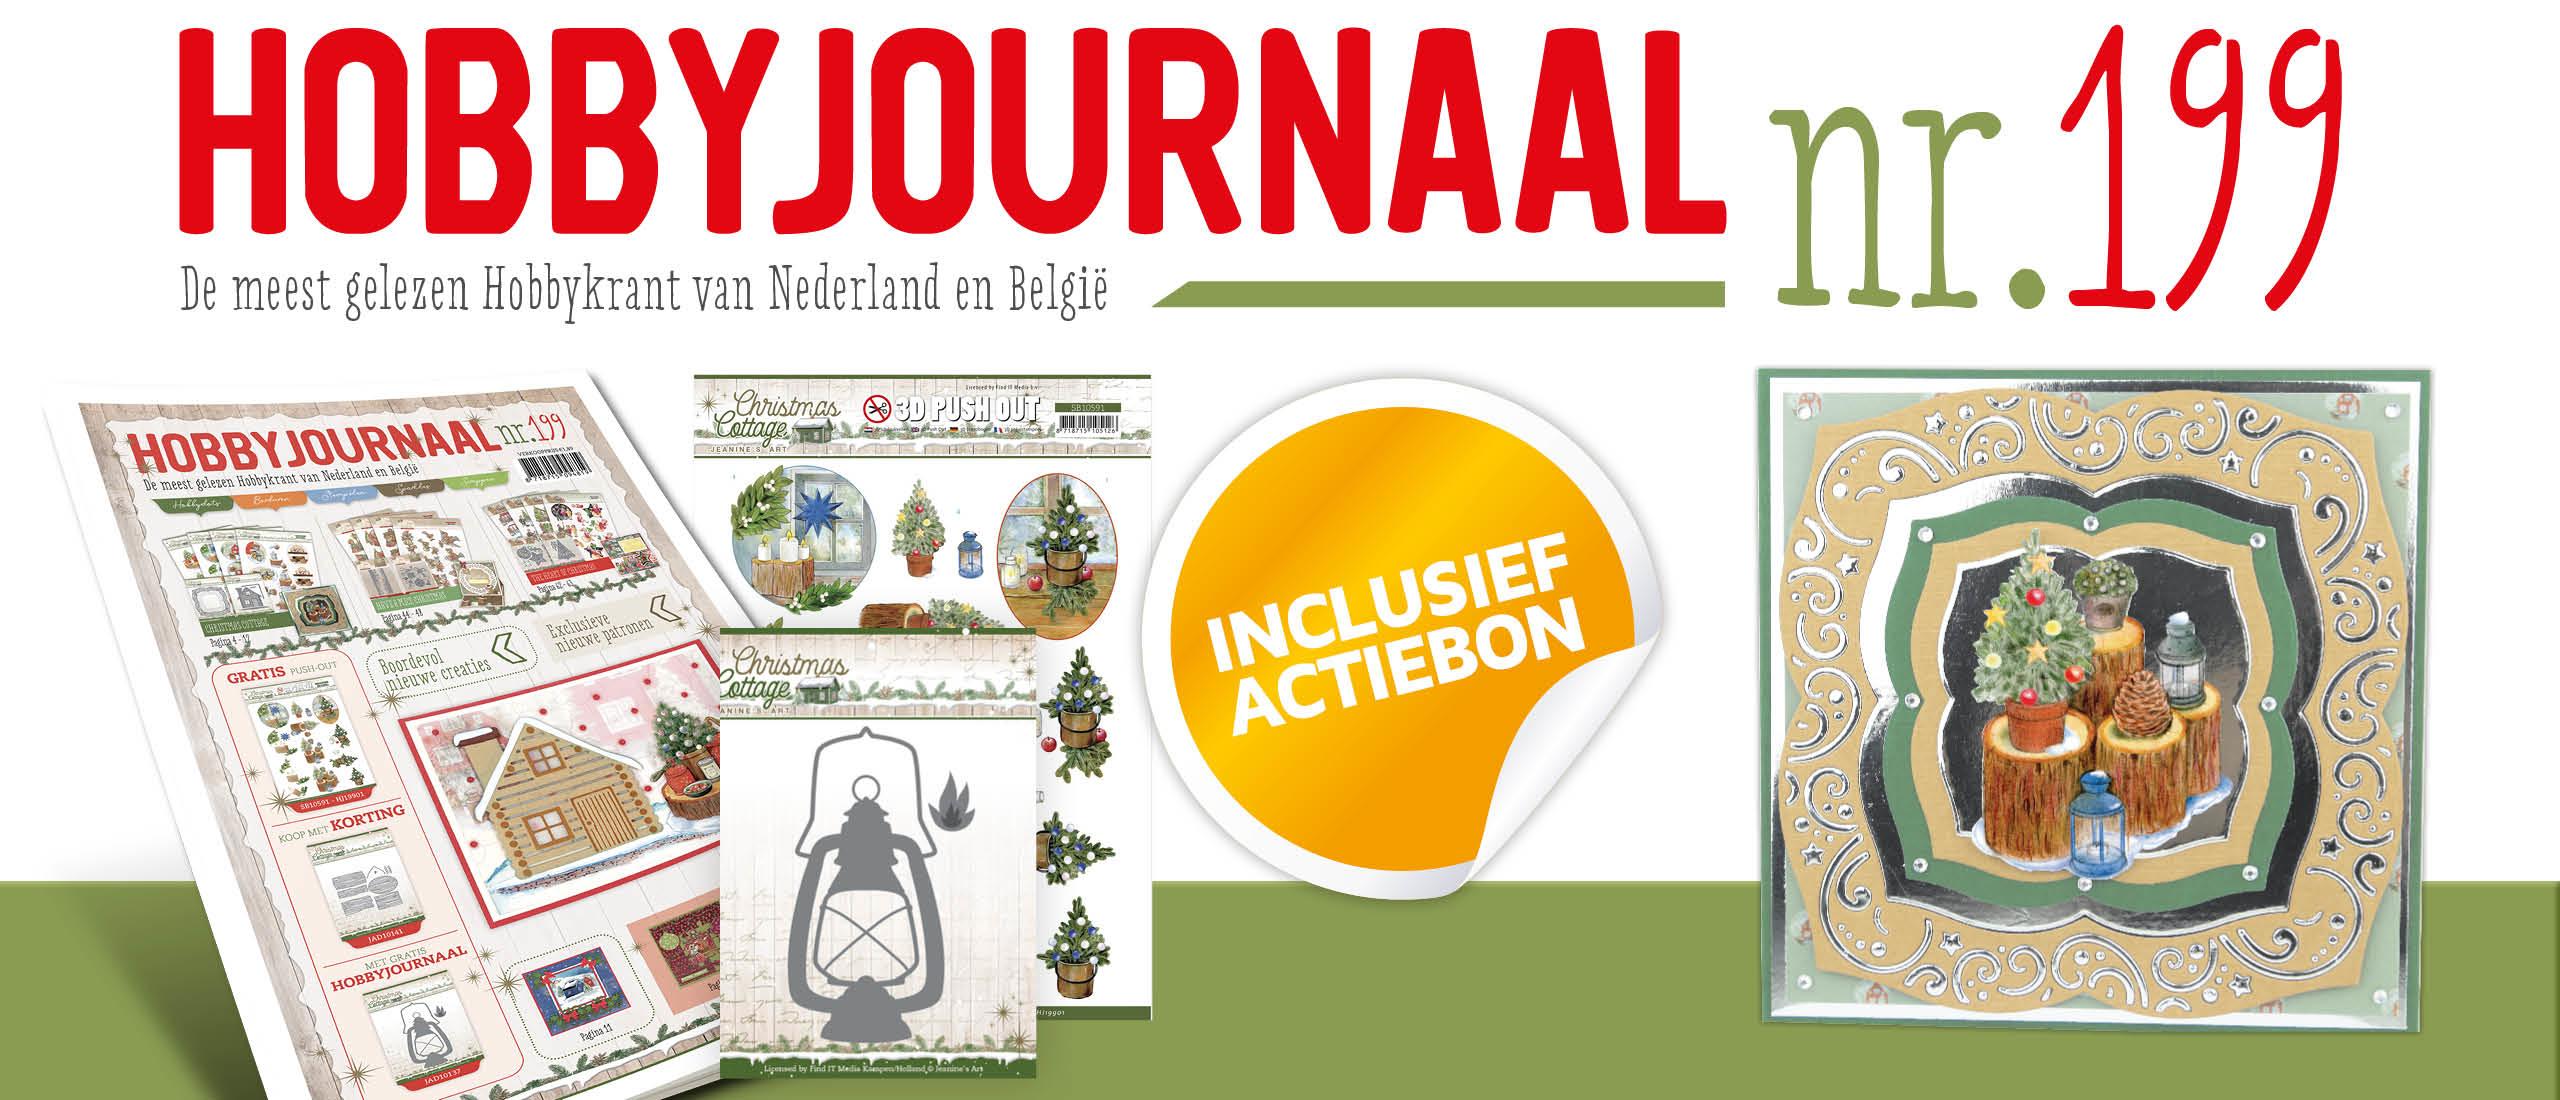 Hobbyjournaal 199 (SETHJ199-JAD10137)